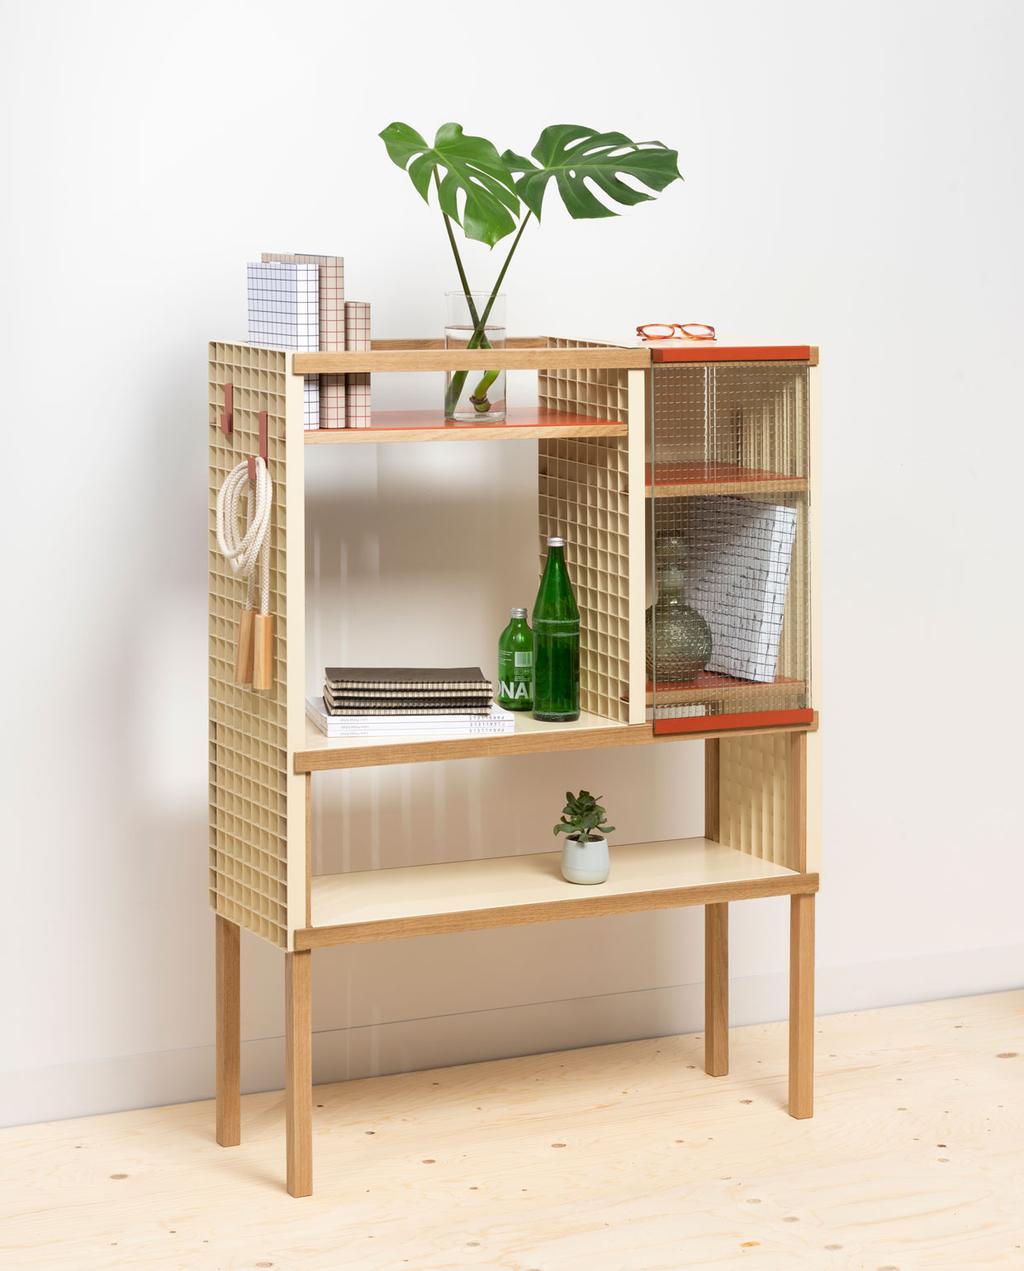 vtwonen | blog StudentDesign design bij jou thuis